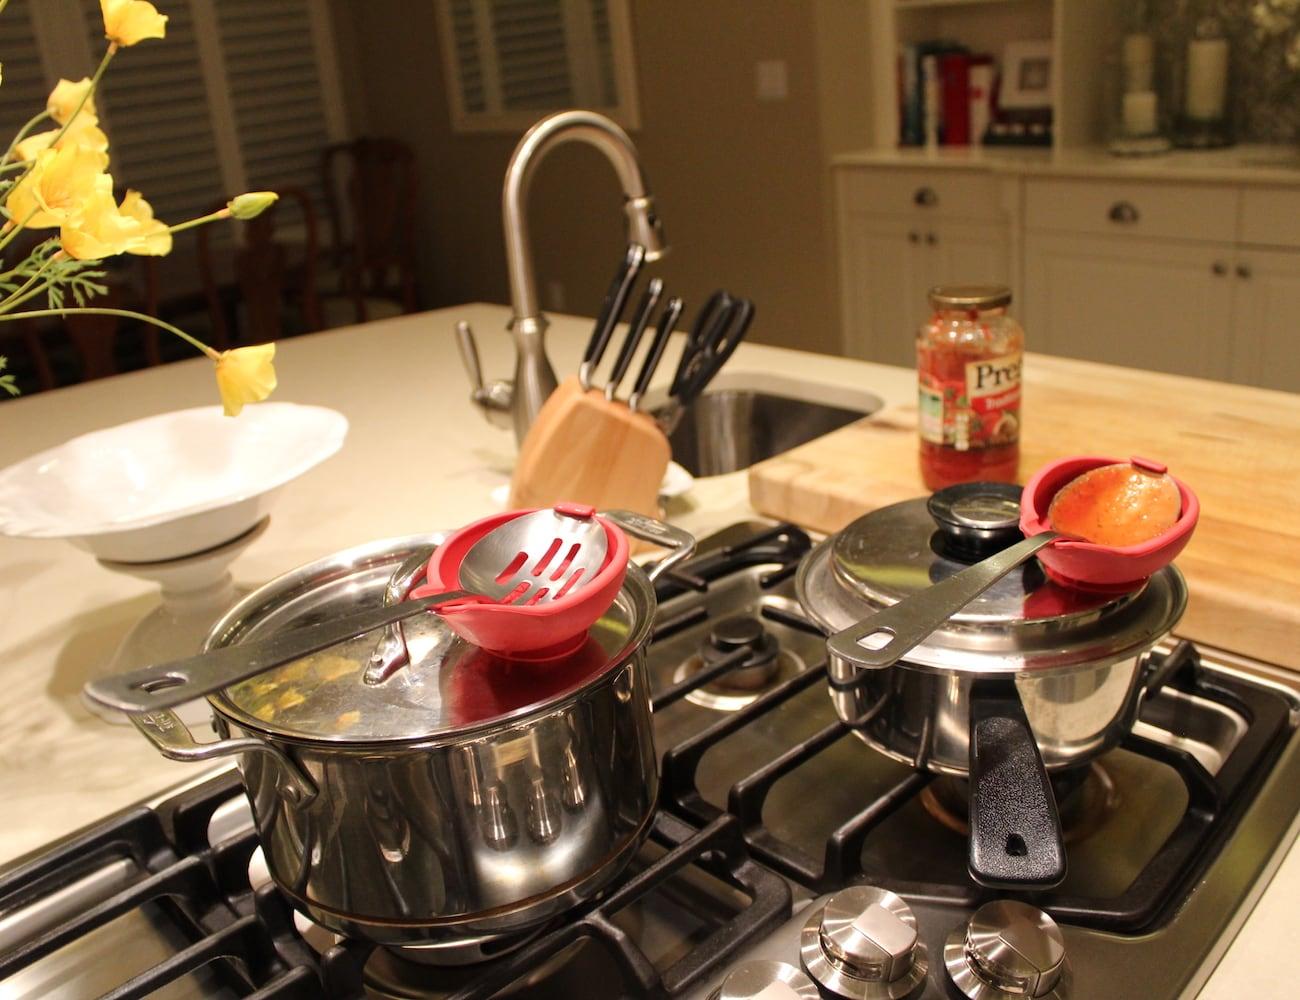 SpoonBuddy Multi-Use Kitchen Gadget